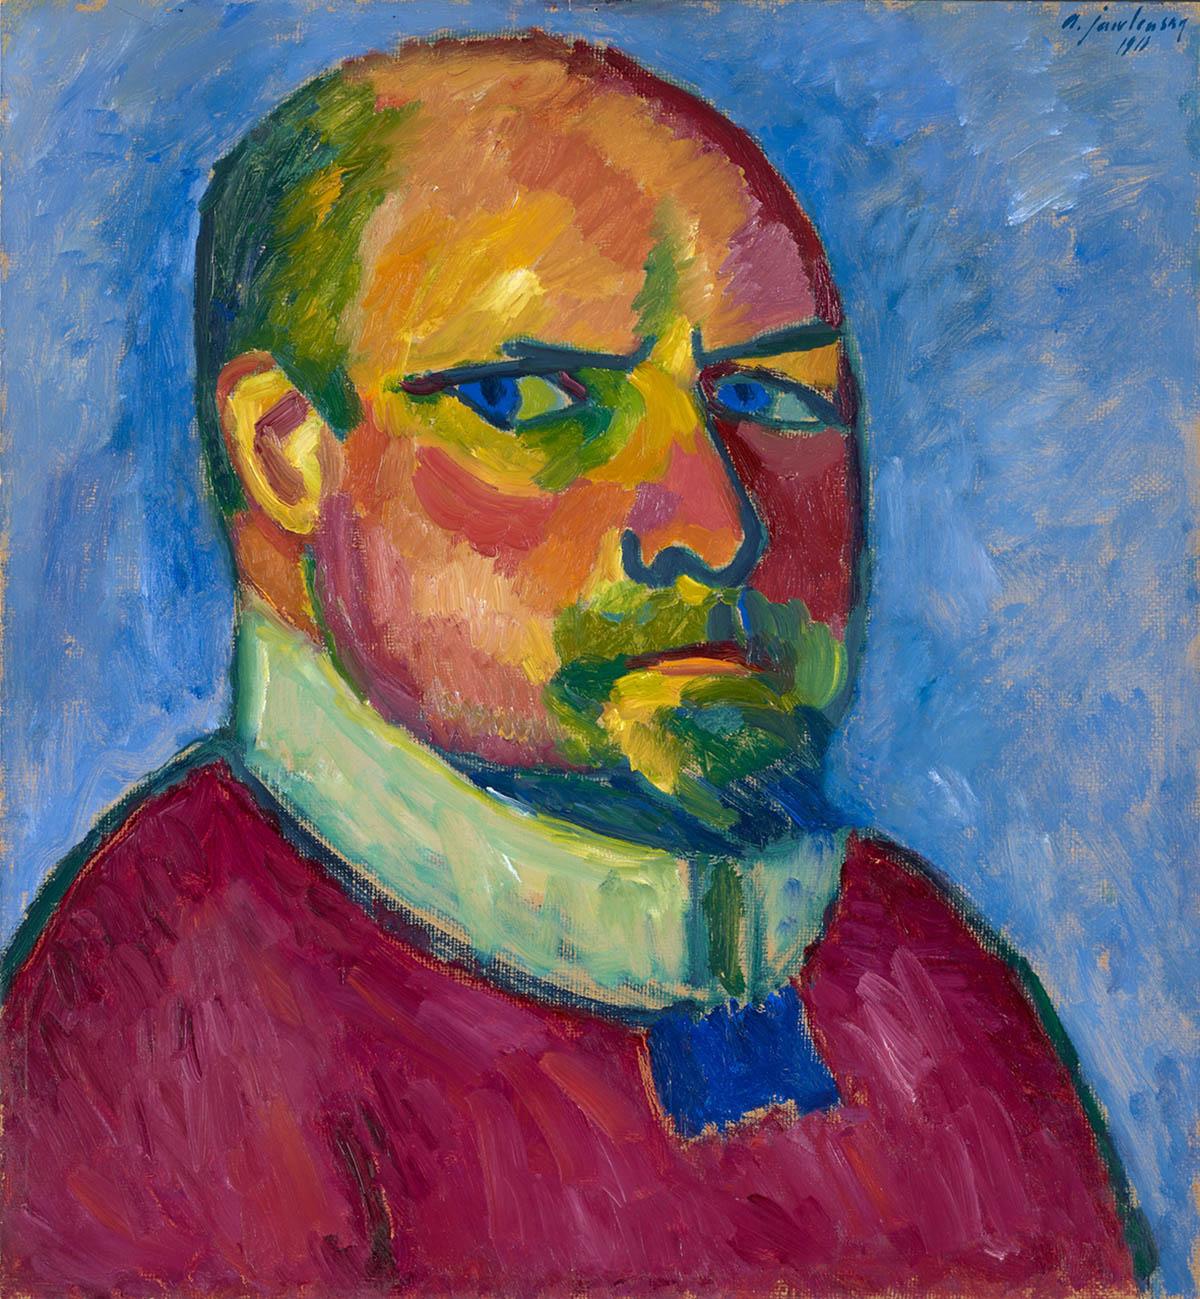 Alexej von Jawlensky, Selbstbildnis, 1911